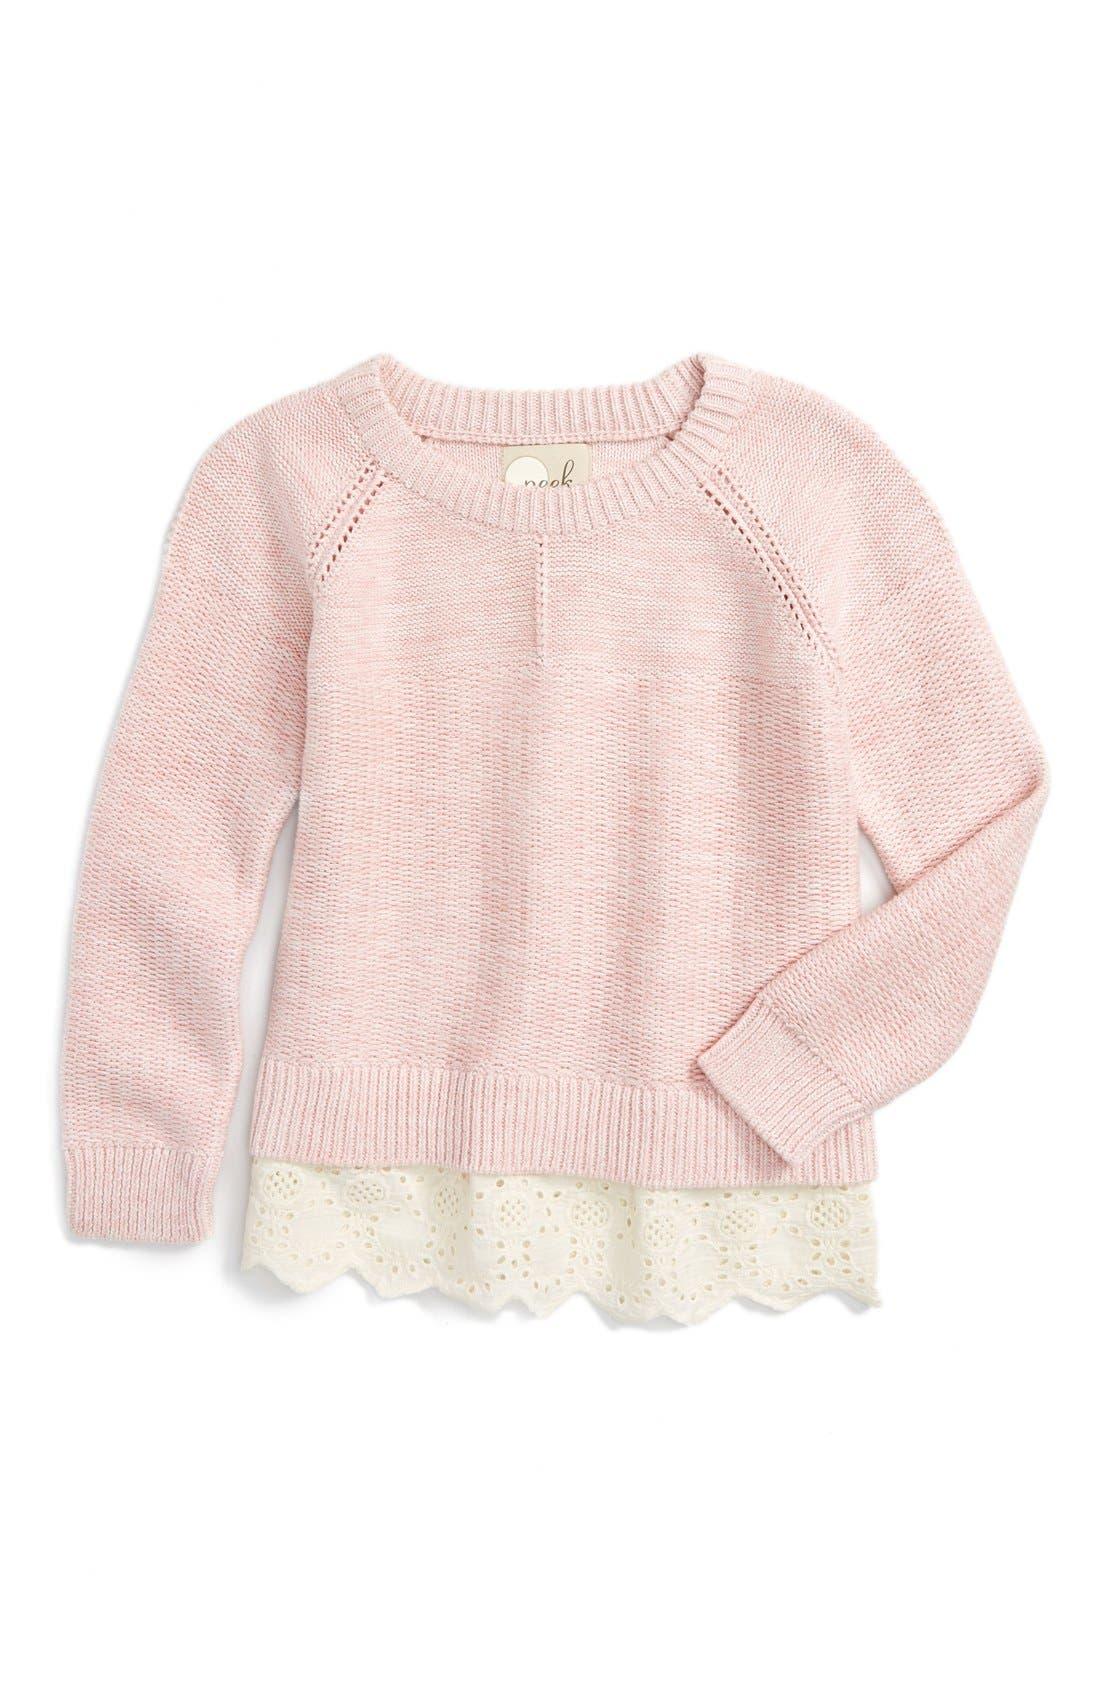 Alternate Image 1 Selected - Peek Lulu Sweater (Toddler Girls, Little Girls & Big Girls)